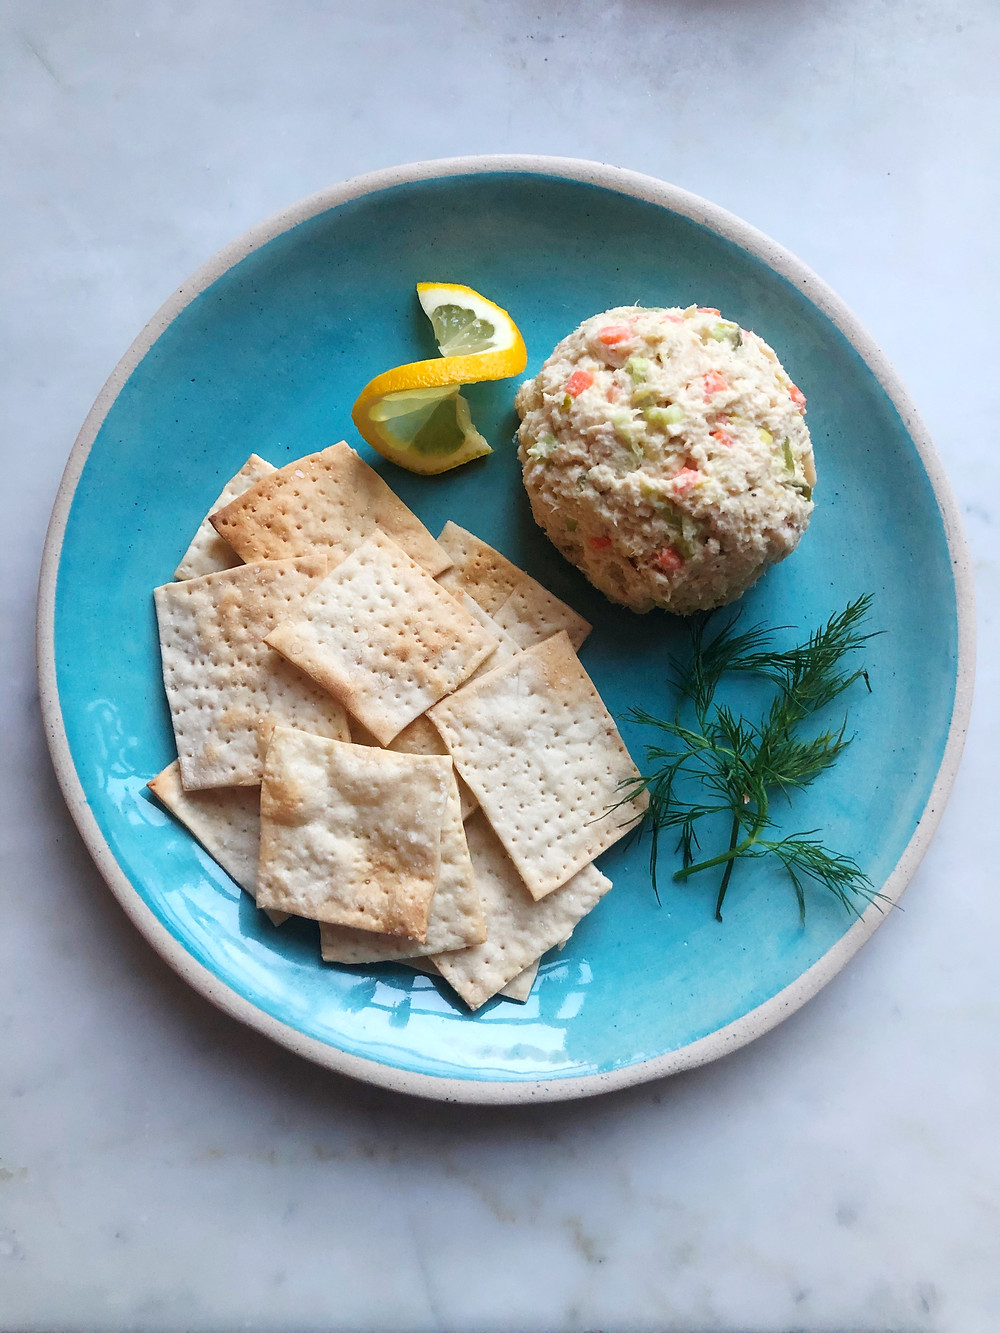 Best Ever Tuna Salad with Homemade Matzo